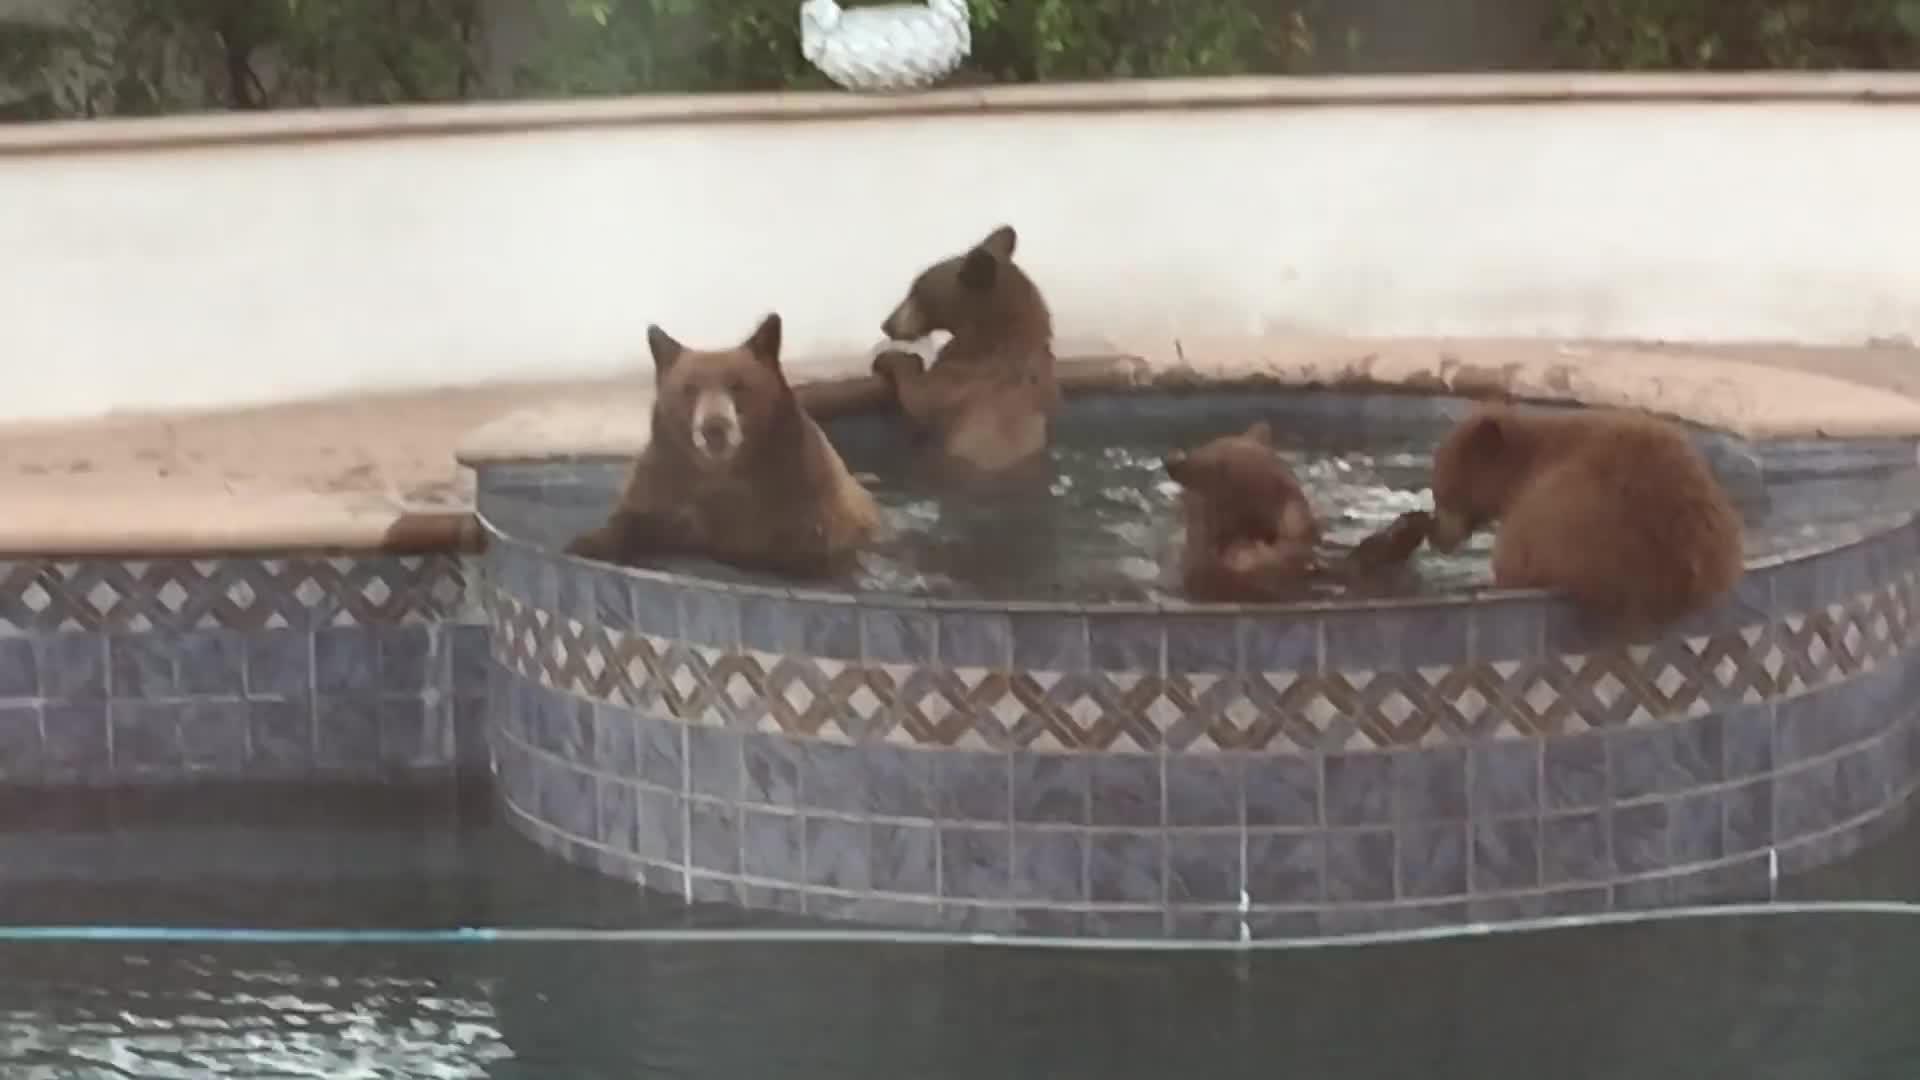 bath, bear, bears, pool, wildlife, bears in the pool GIFs